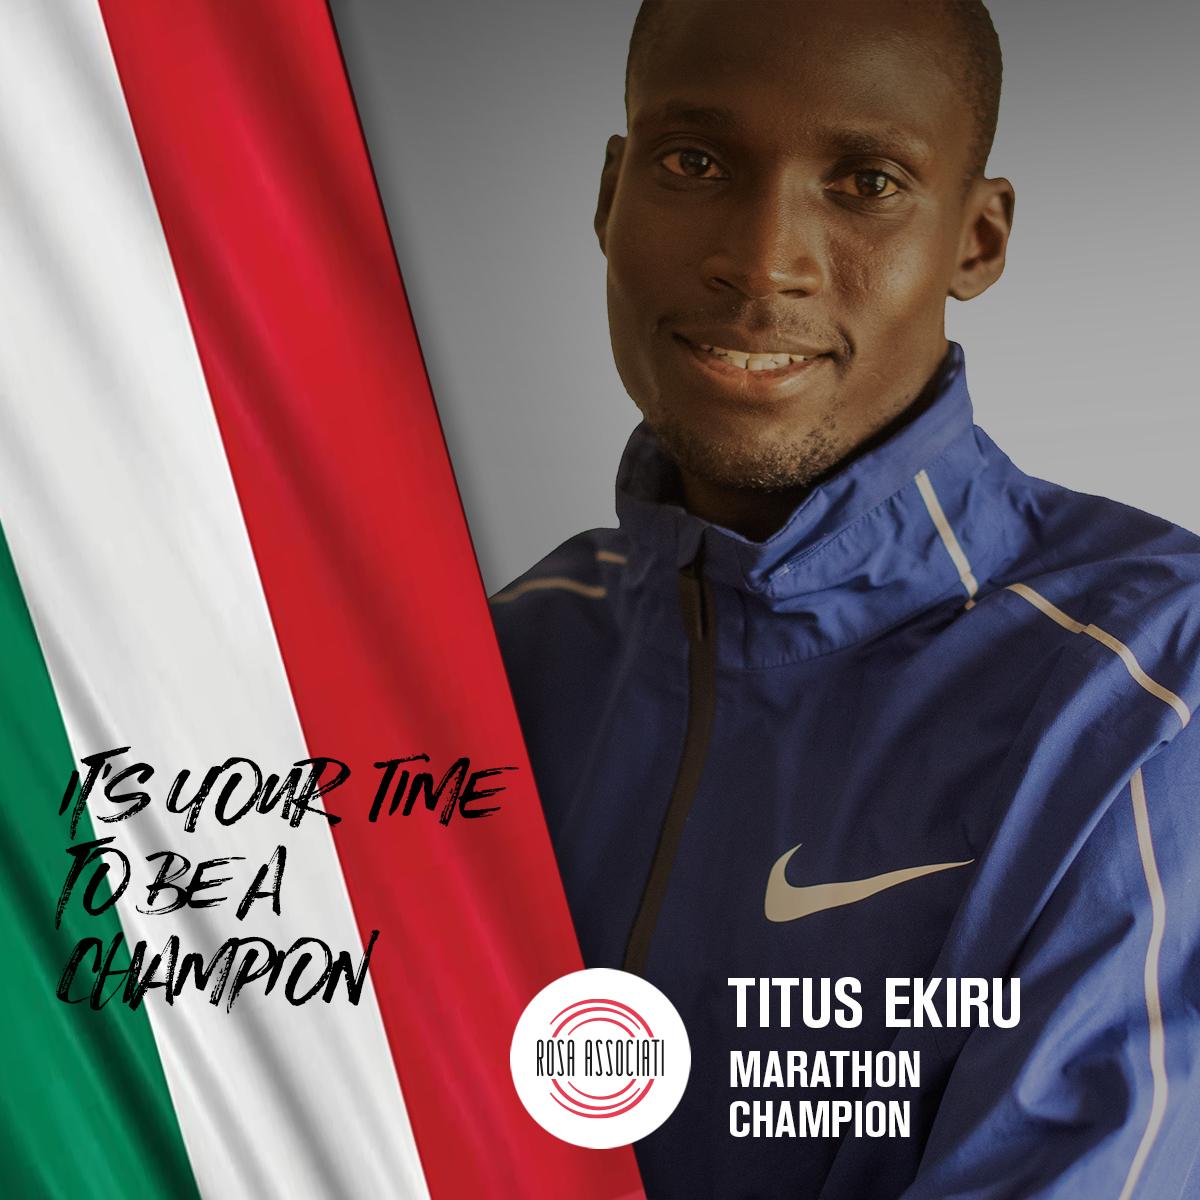 21 2020 - Campagna social We can win this race together - Titus Ekiru